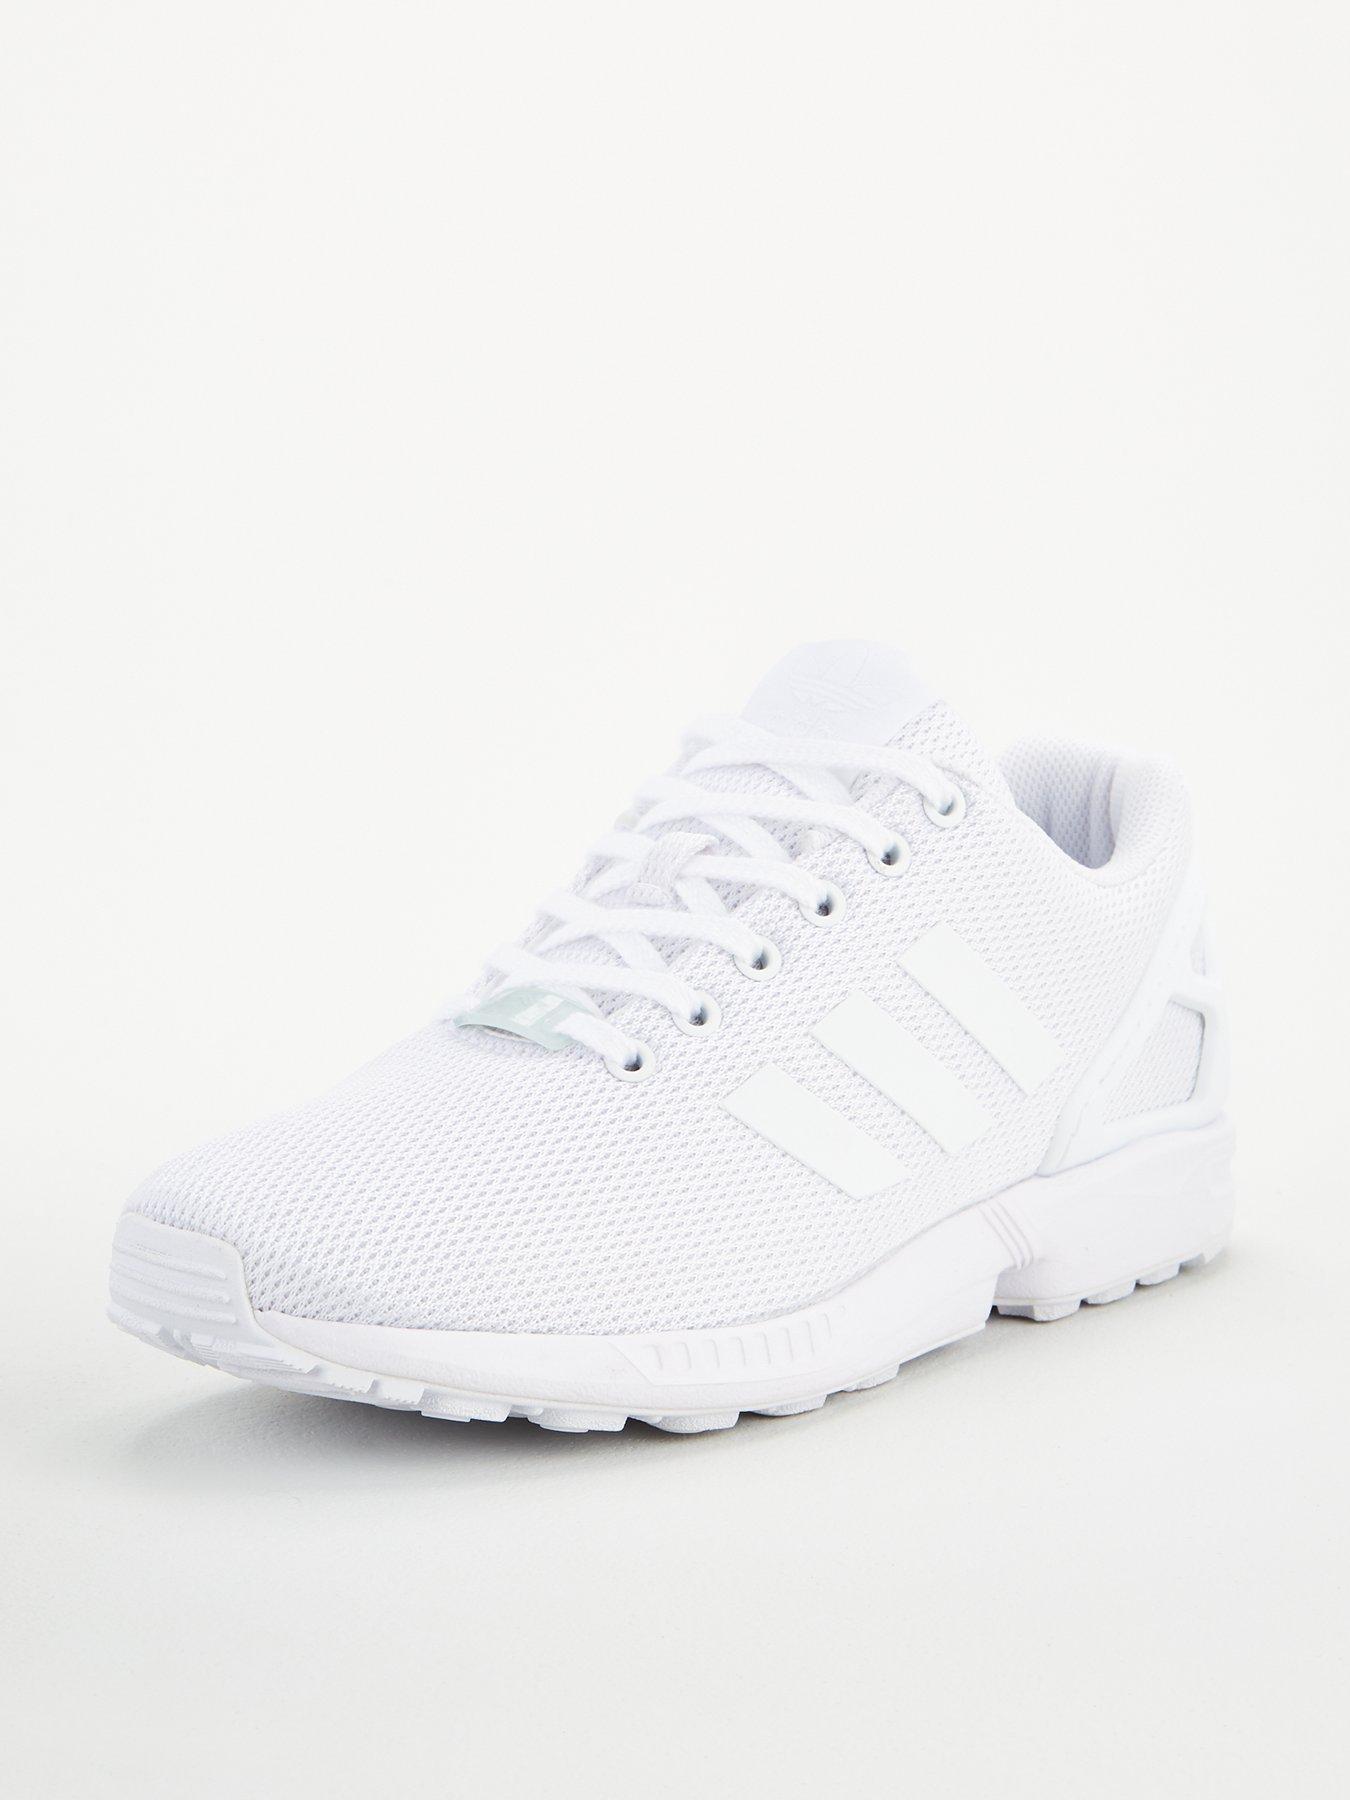 adidas Originals ZX | Adidas | Trainers